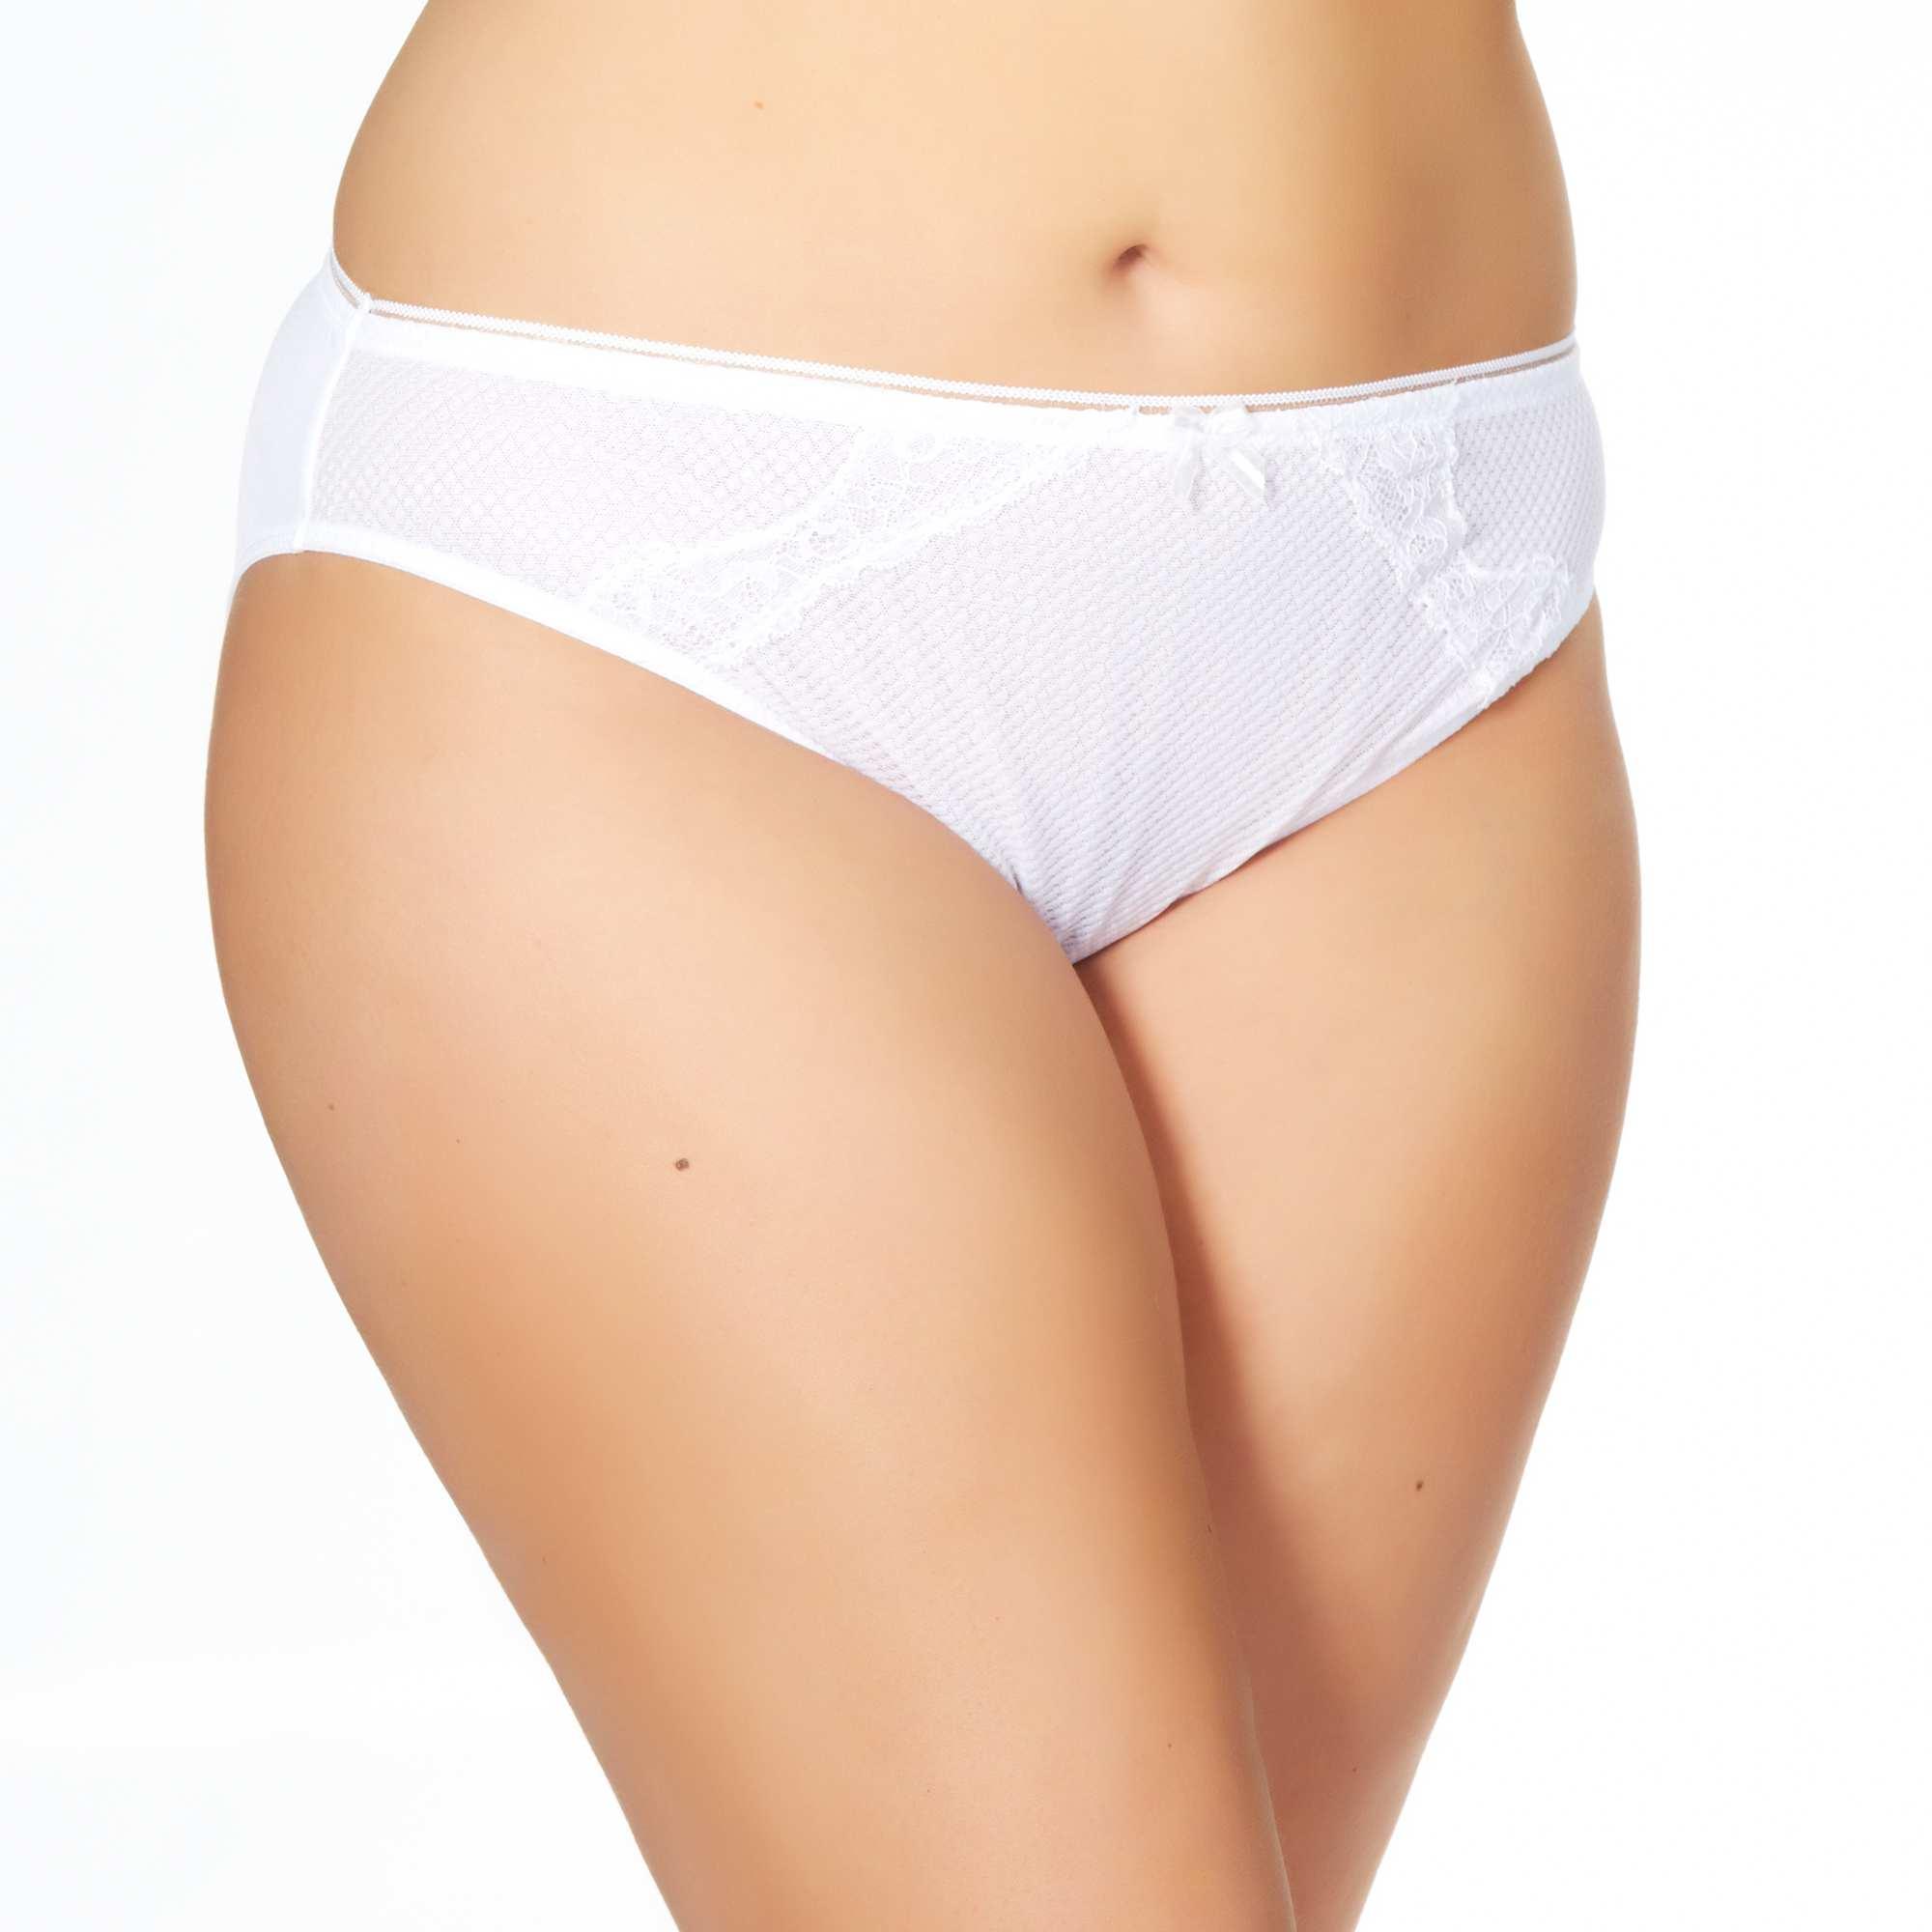 culotte tulle et microfibre grande taille femme blanc kiabi 10 00. Black Bedroom Furniture Sets. Home Design Ideas